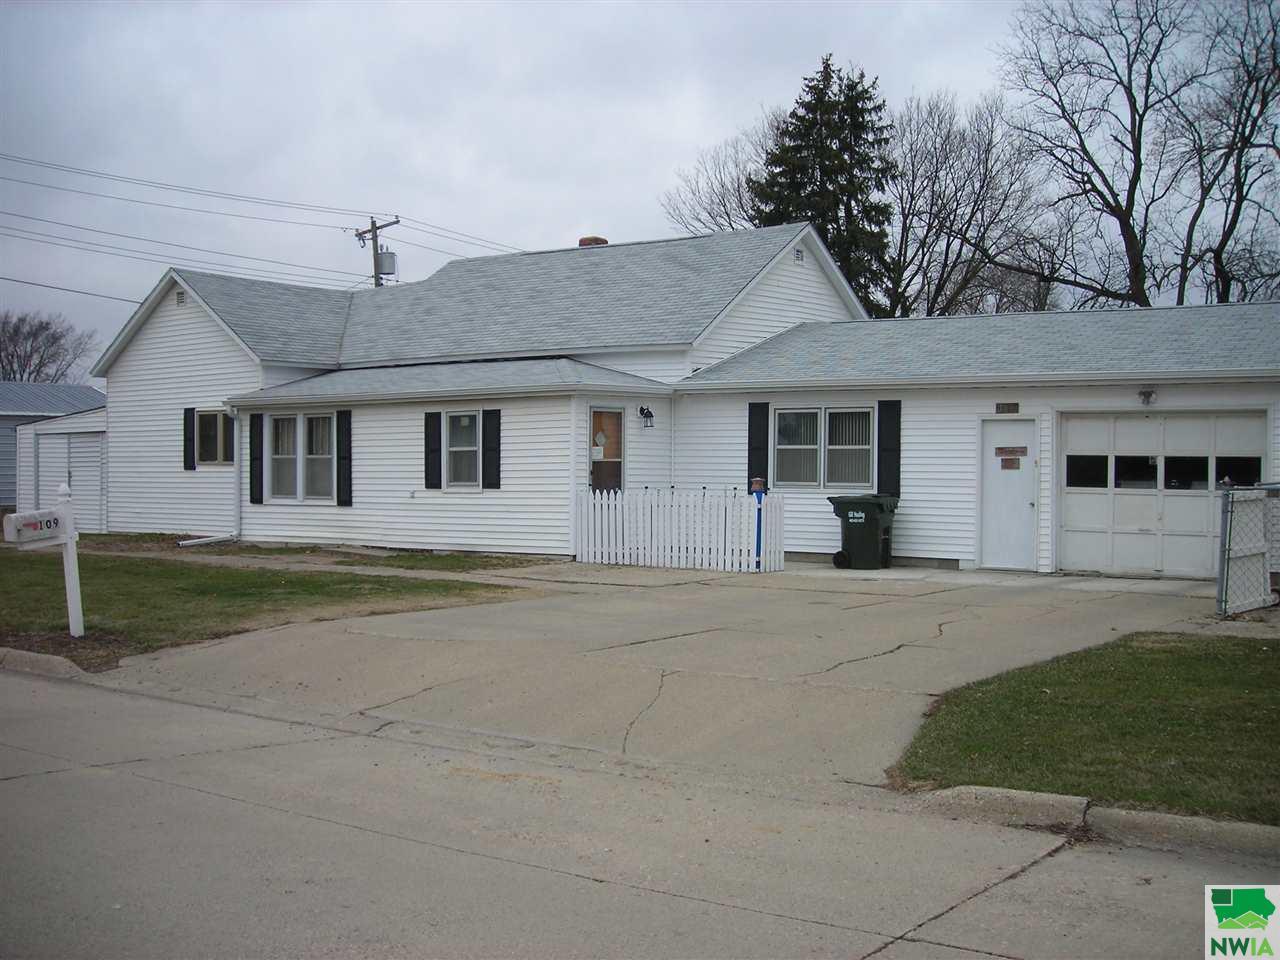 Property for sale at 109 S 17th Unit: Street, Dakota City,  NE 68731